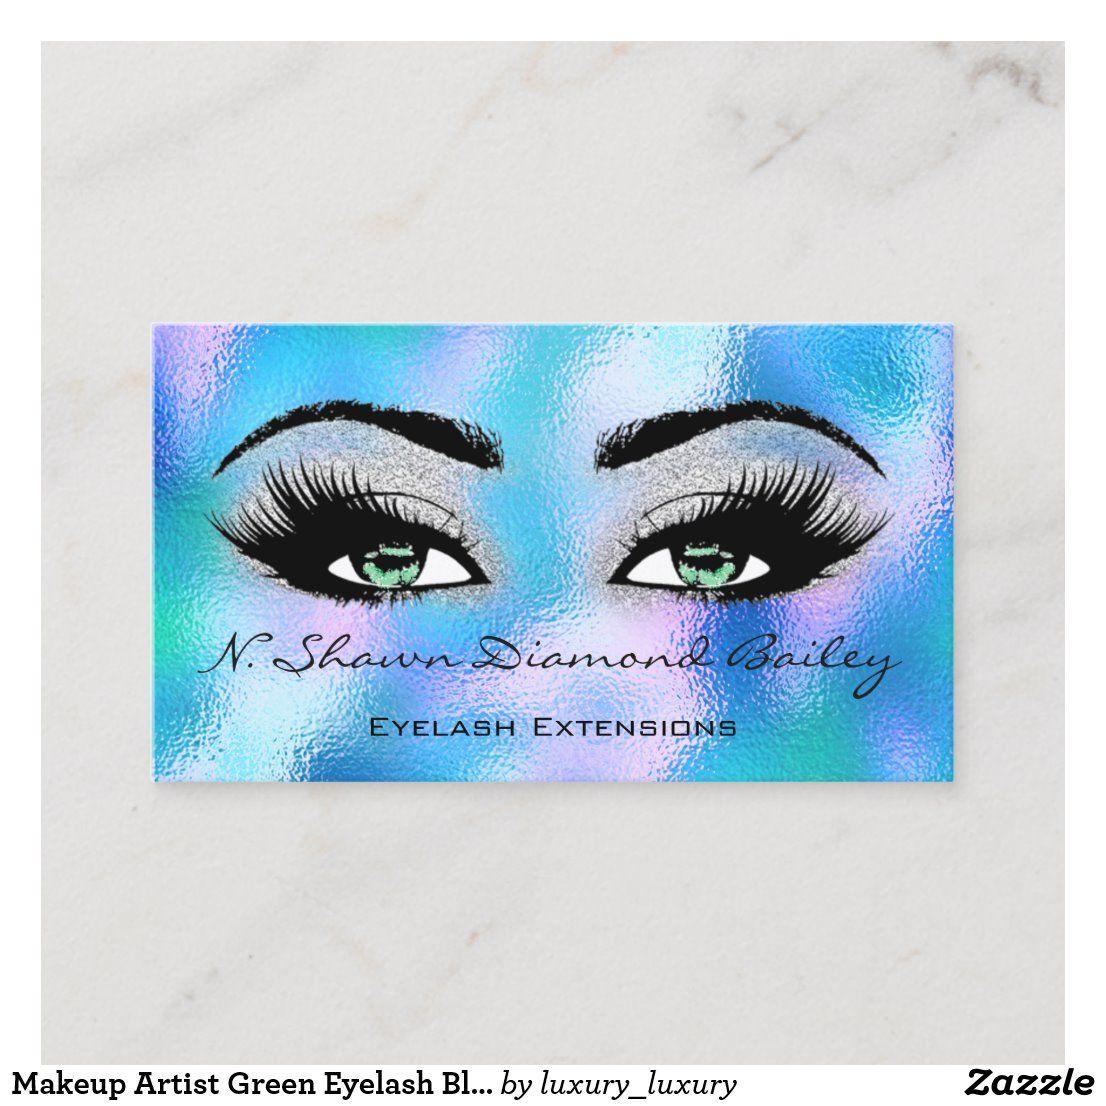 Makeup Artist Green Eyelash Blue Holographic GLASS